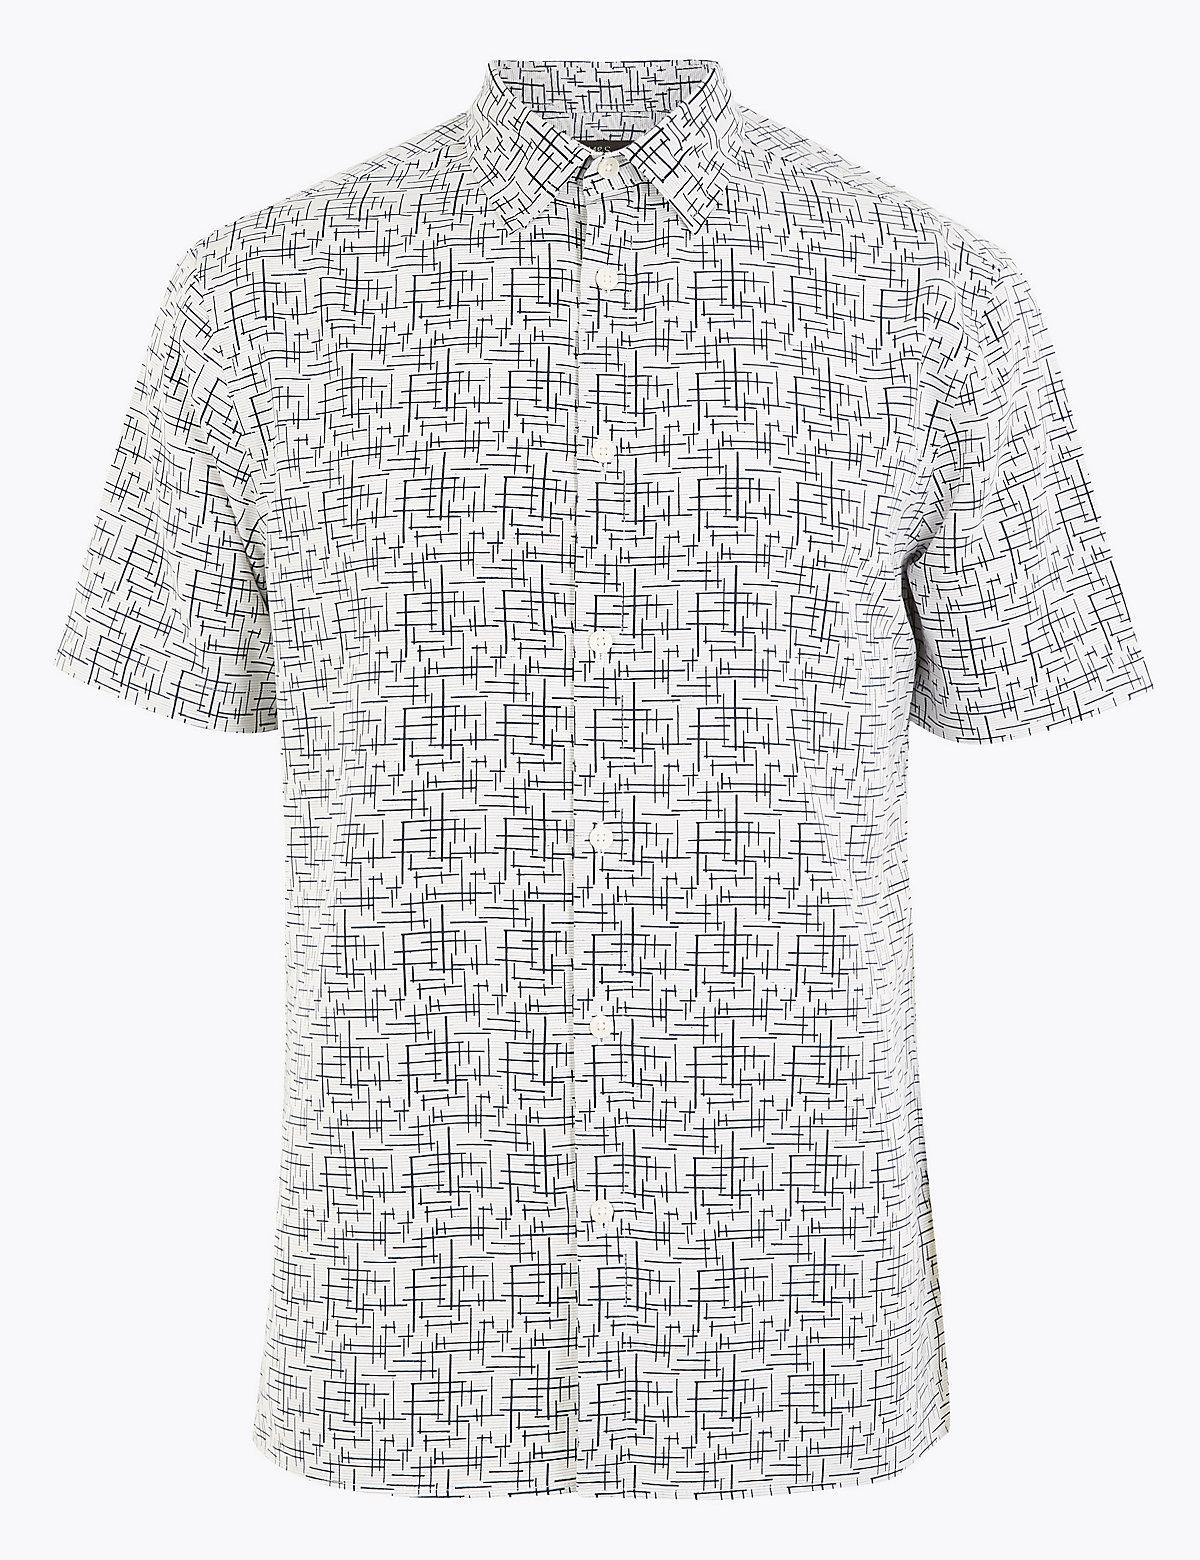 Мужская рубашка с коротким рукавом и геометрическим принтом